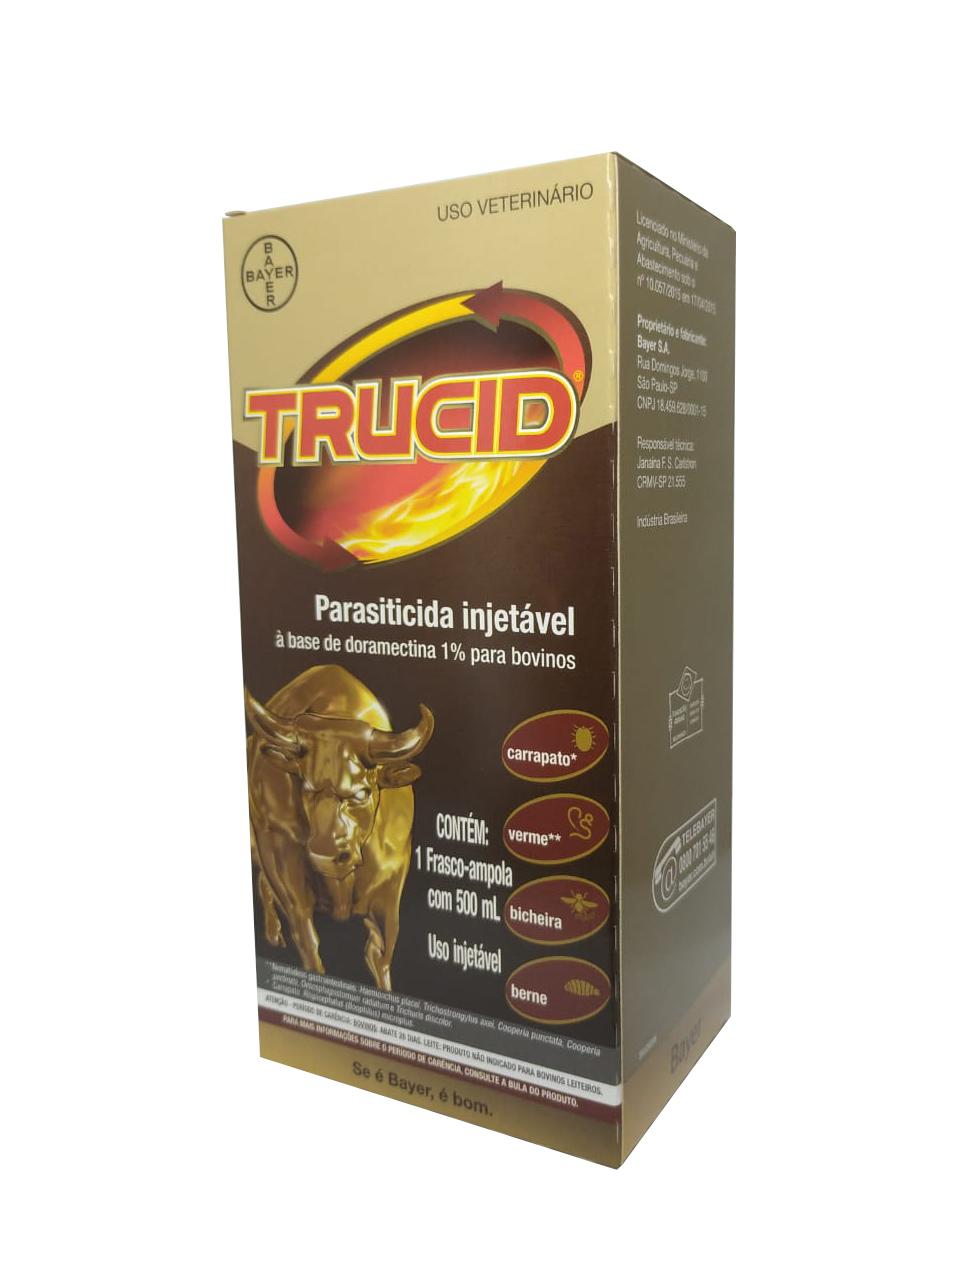 Trucid - Doramectina 1% 500 ml - Bayer